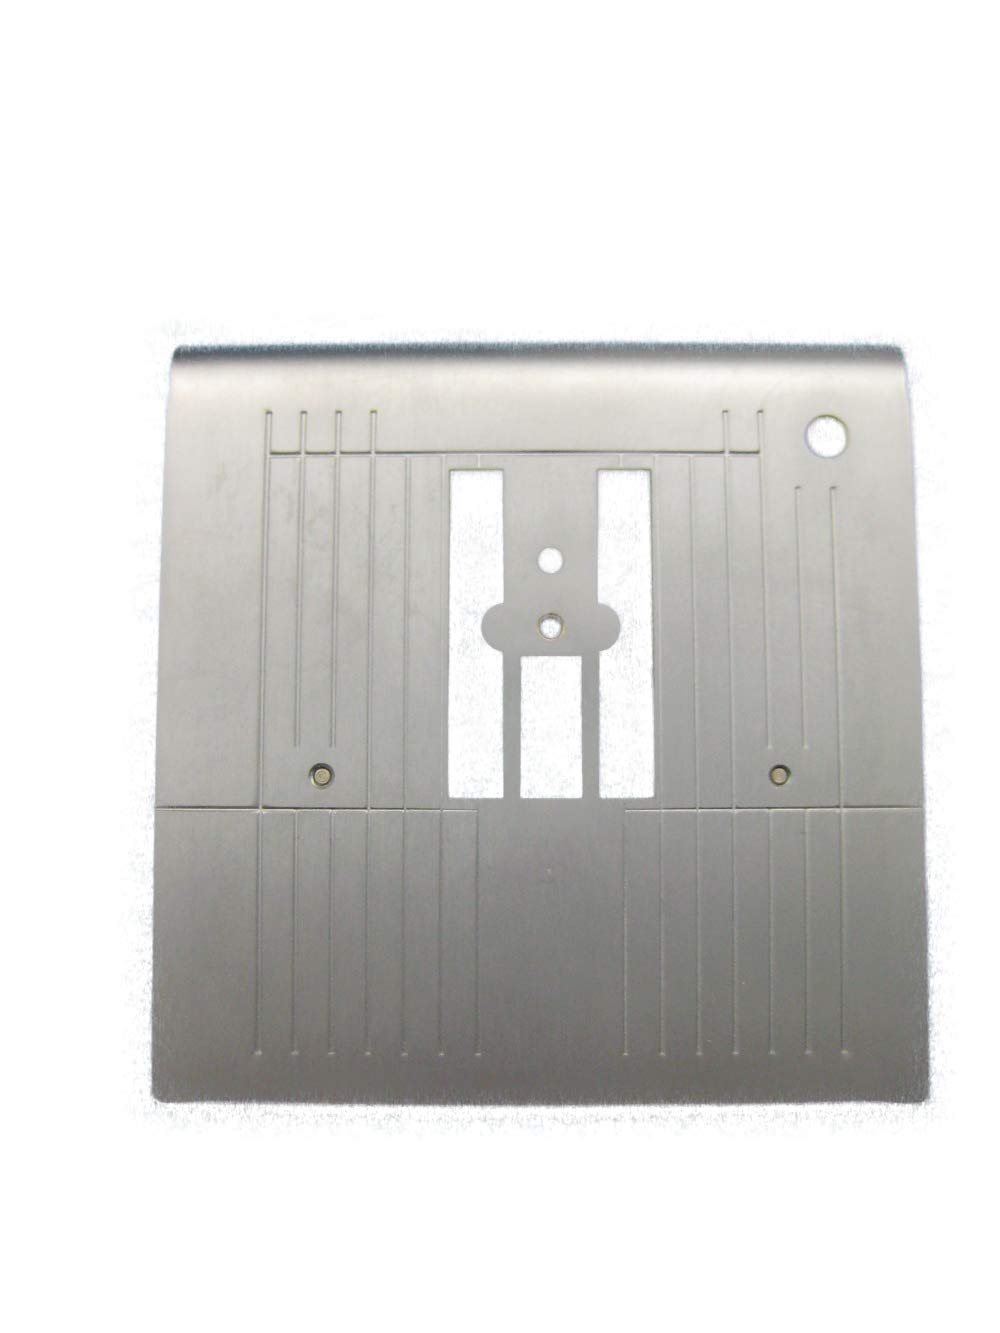 ONLY BlueArrowExpress Bernina Straight Stitch Needle Plate # 0030987000 For 1630 Model